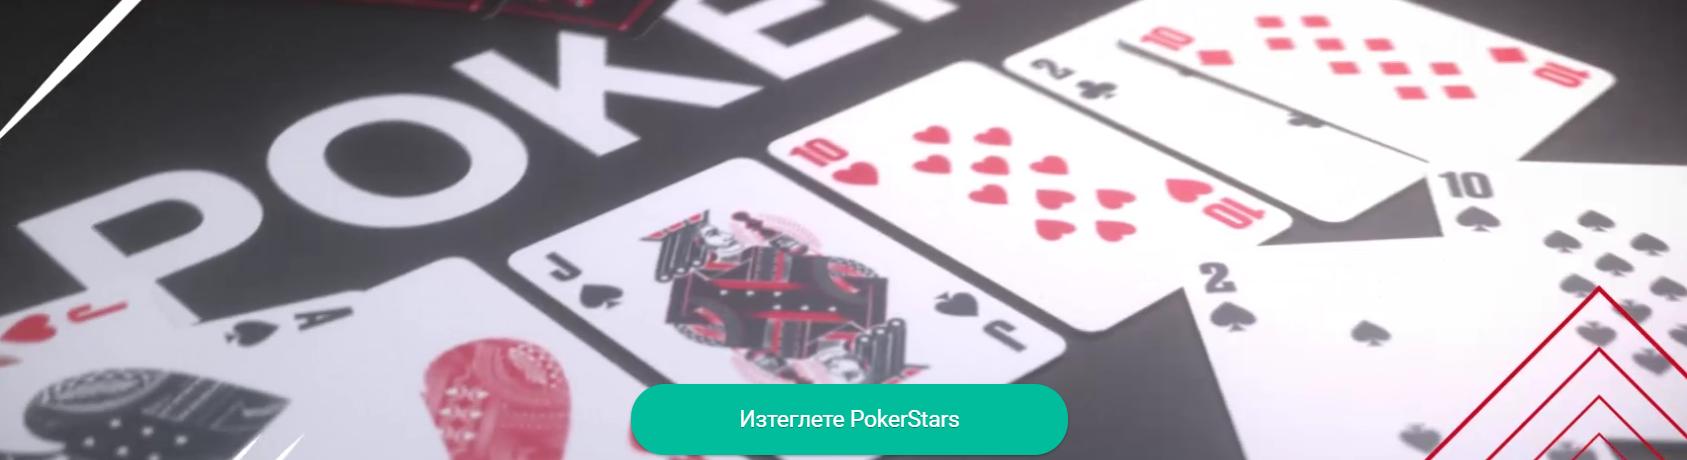 cash masi pokerstars-komarbet.com